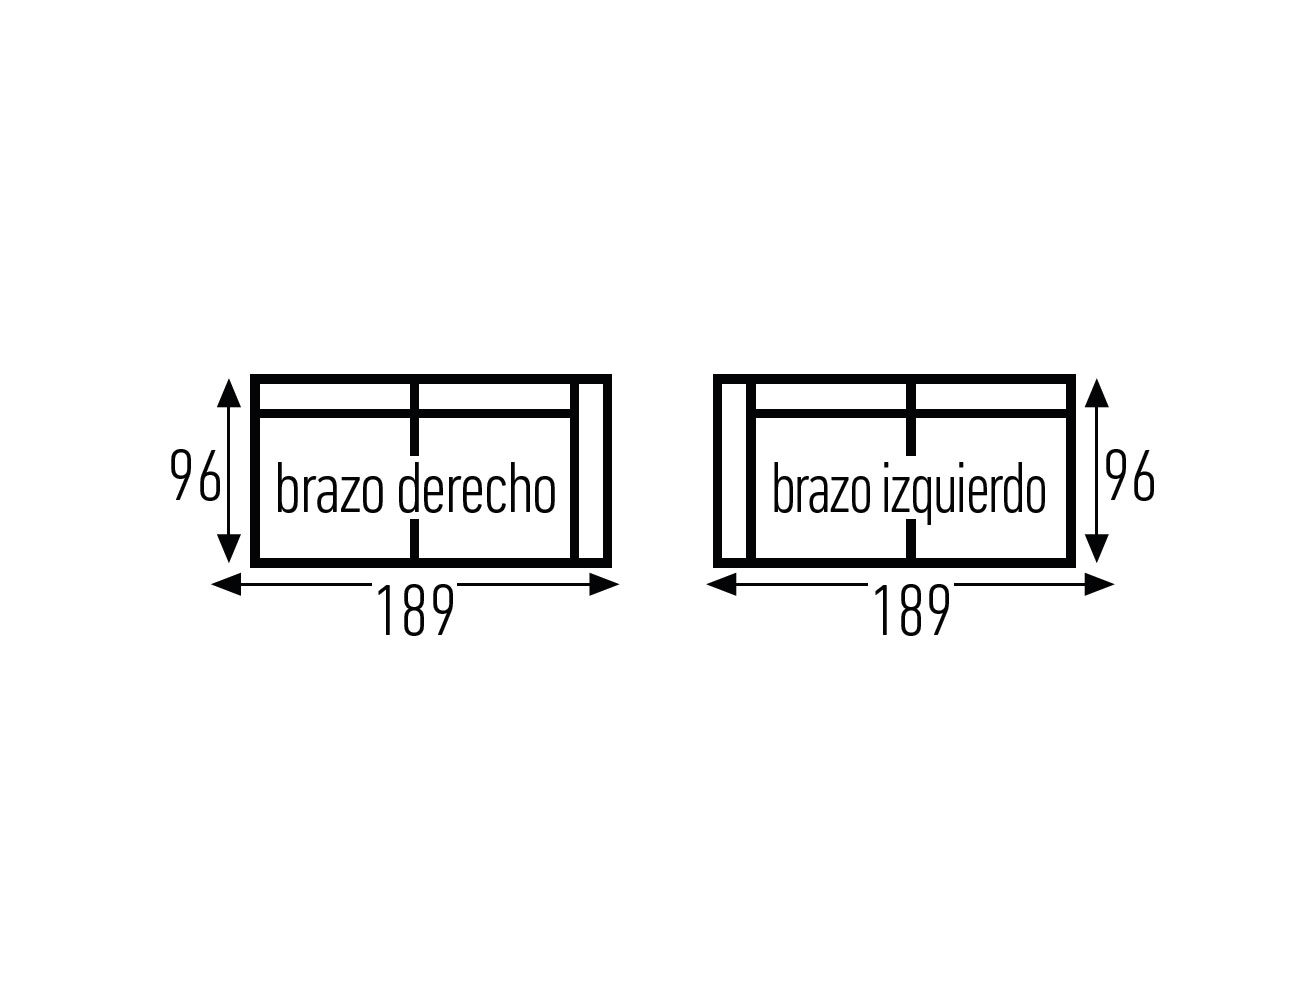 Croquis 3p sin 1 brazo 18912